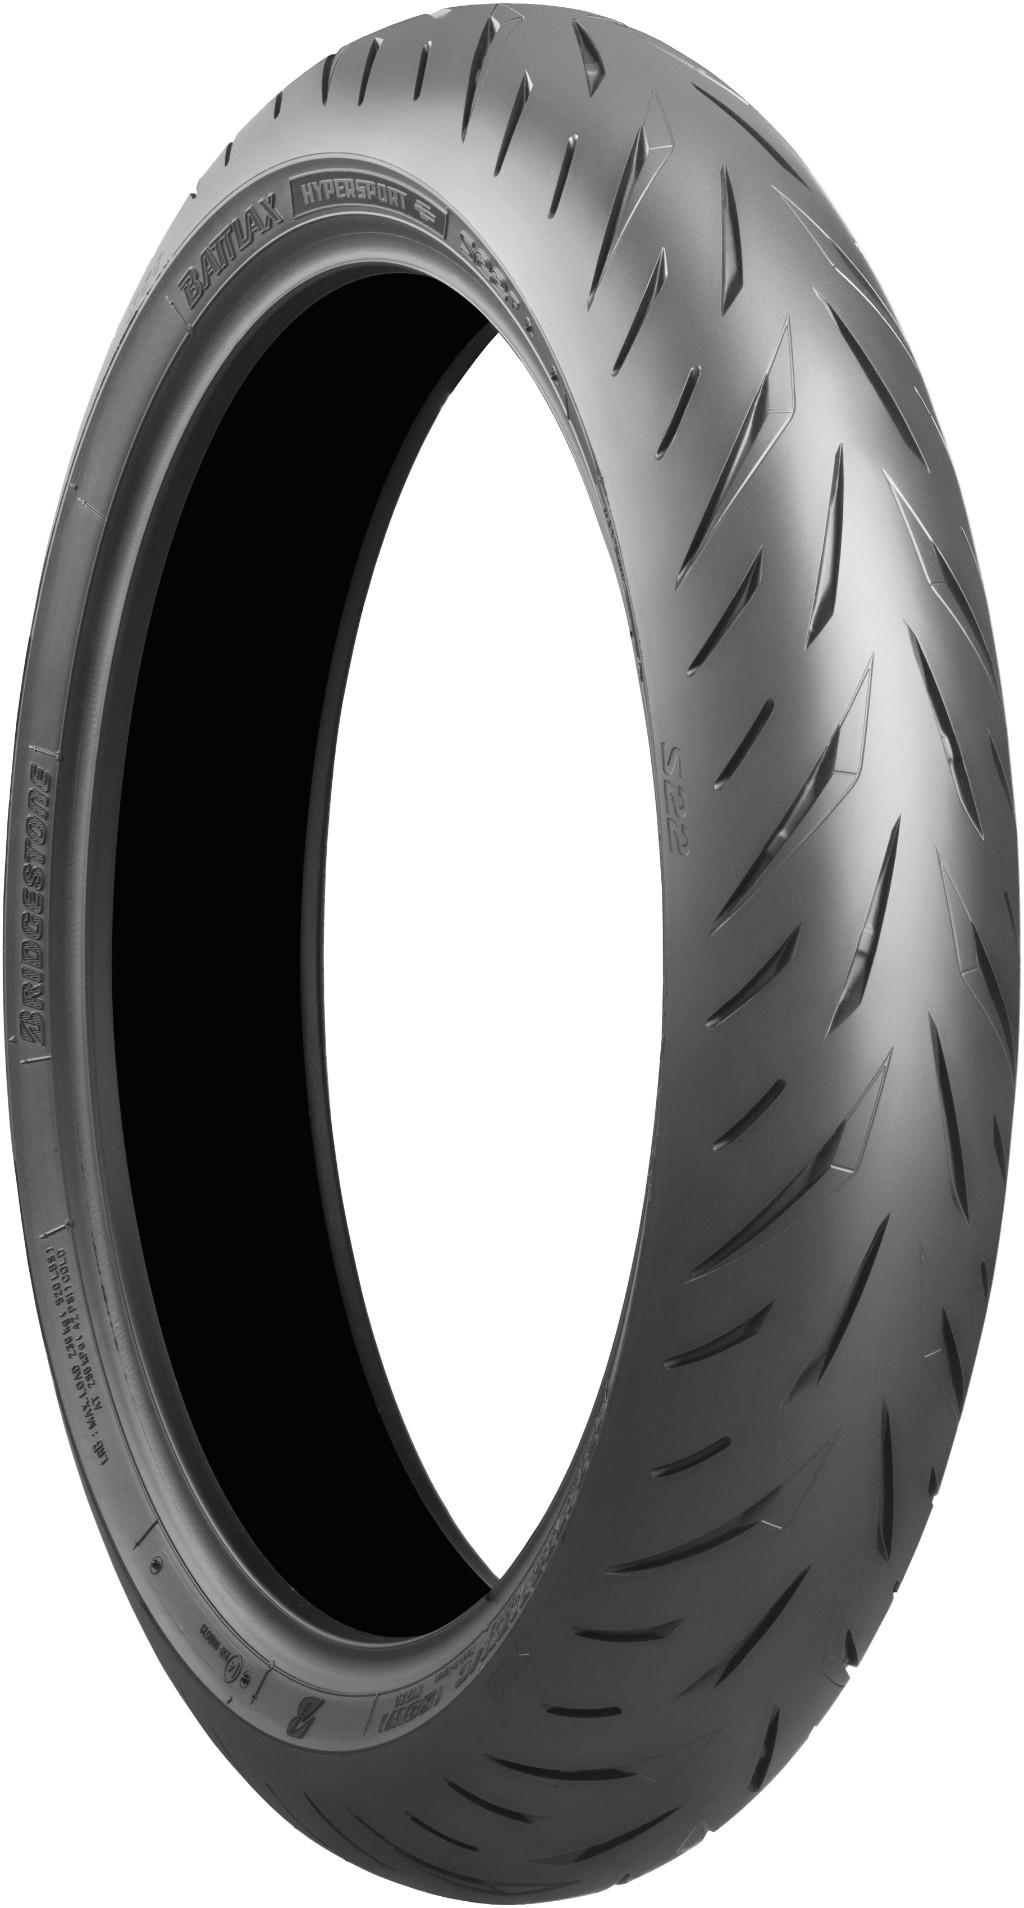 BRIDGESTONE ブリヂストンBATTLAX HYPER SPORT S22【120/70ZR17M/C(58W)】バトラックス ハイパースポーツ タイヤ